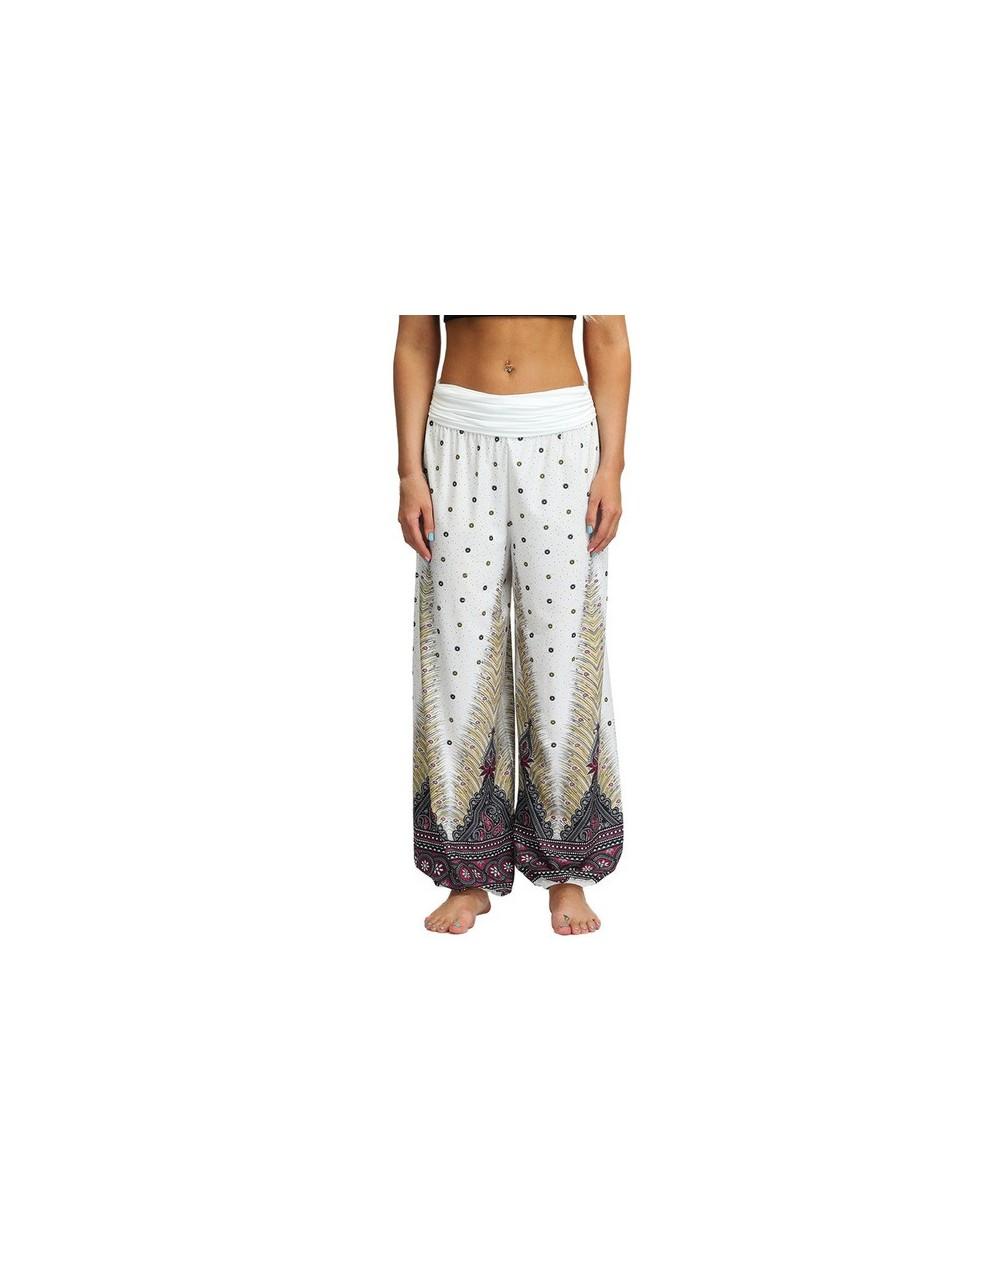 2019 Casual Men Women pants Thai Harem Trousers Hippy Baggy Boho Loose Aladdin Boho Festival Hippy Smock High Waist Pant 5.1...